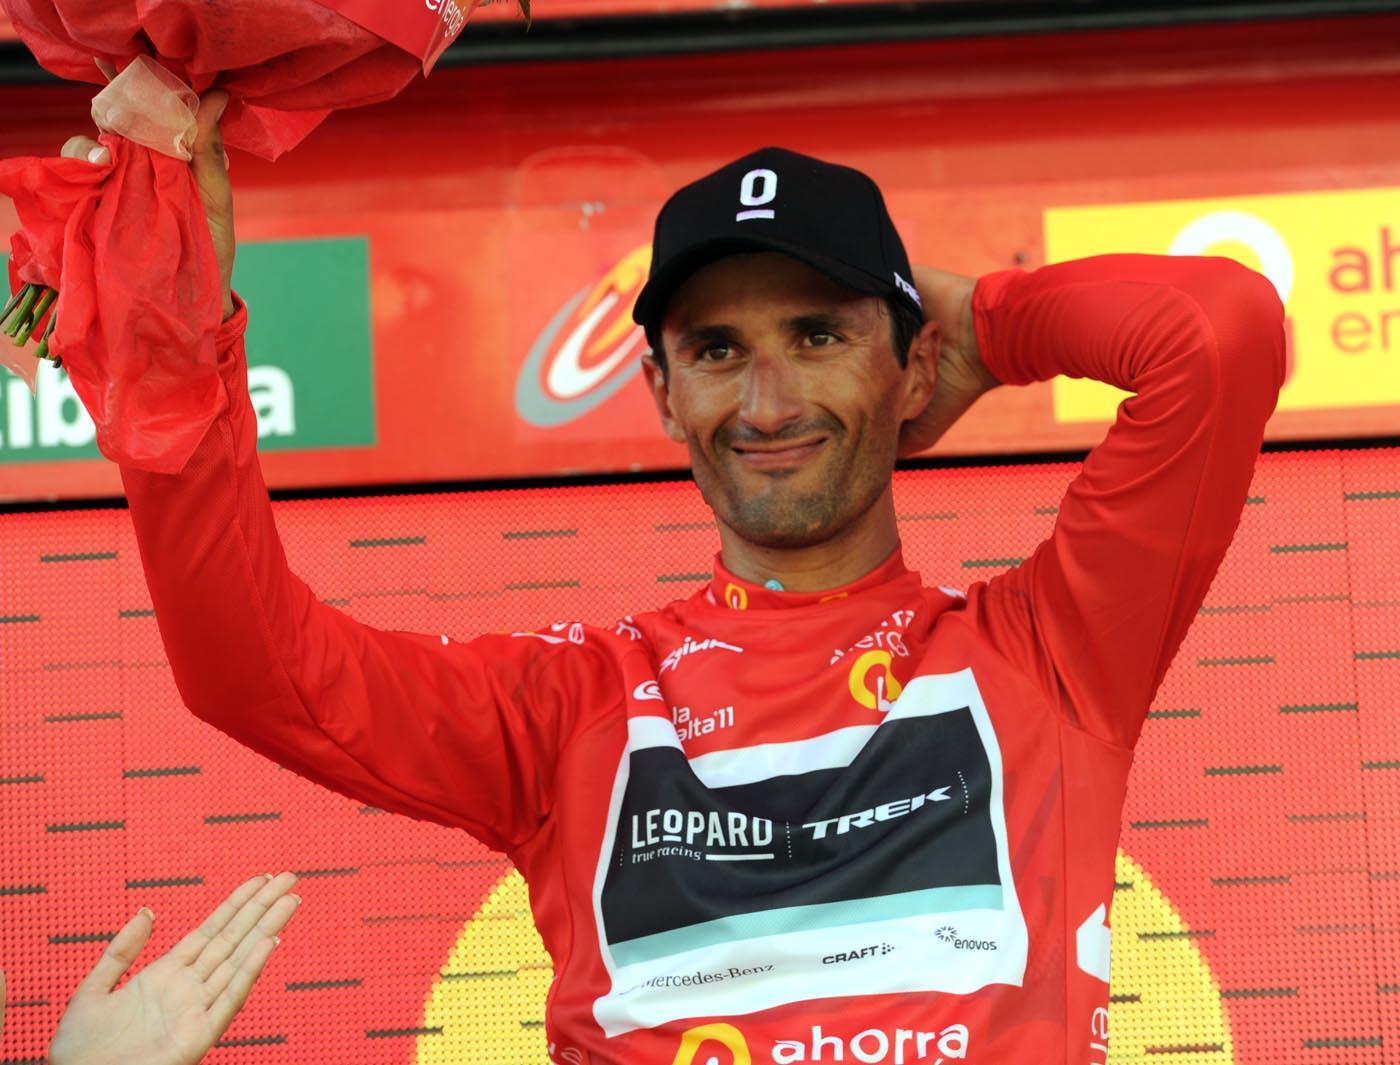 Daniele Bennati leads, Vuelta a Espana 2011, stage two